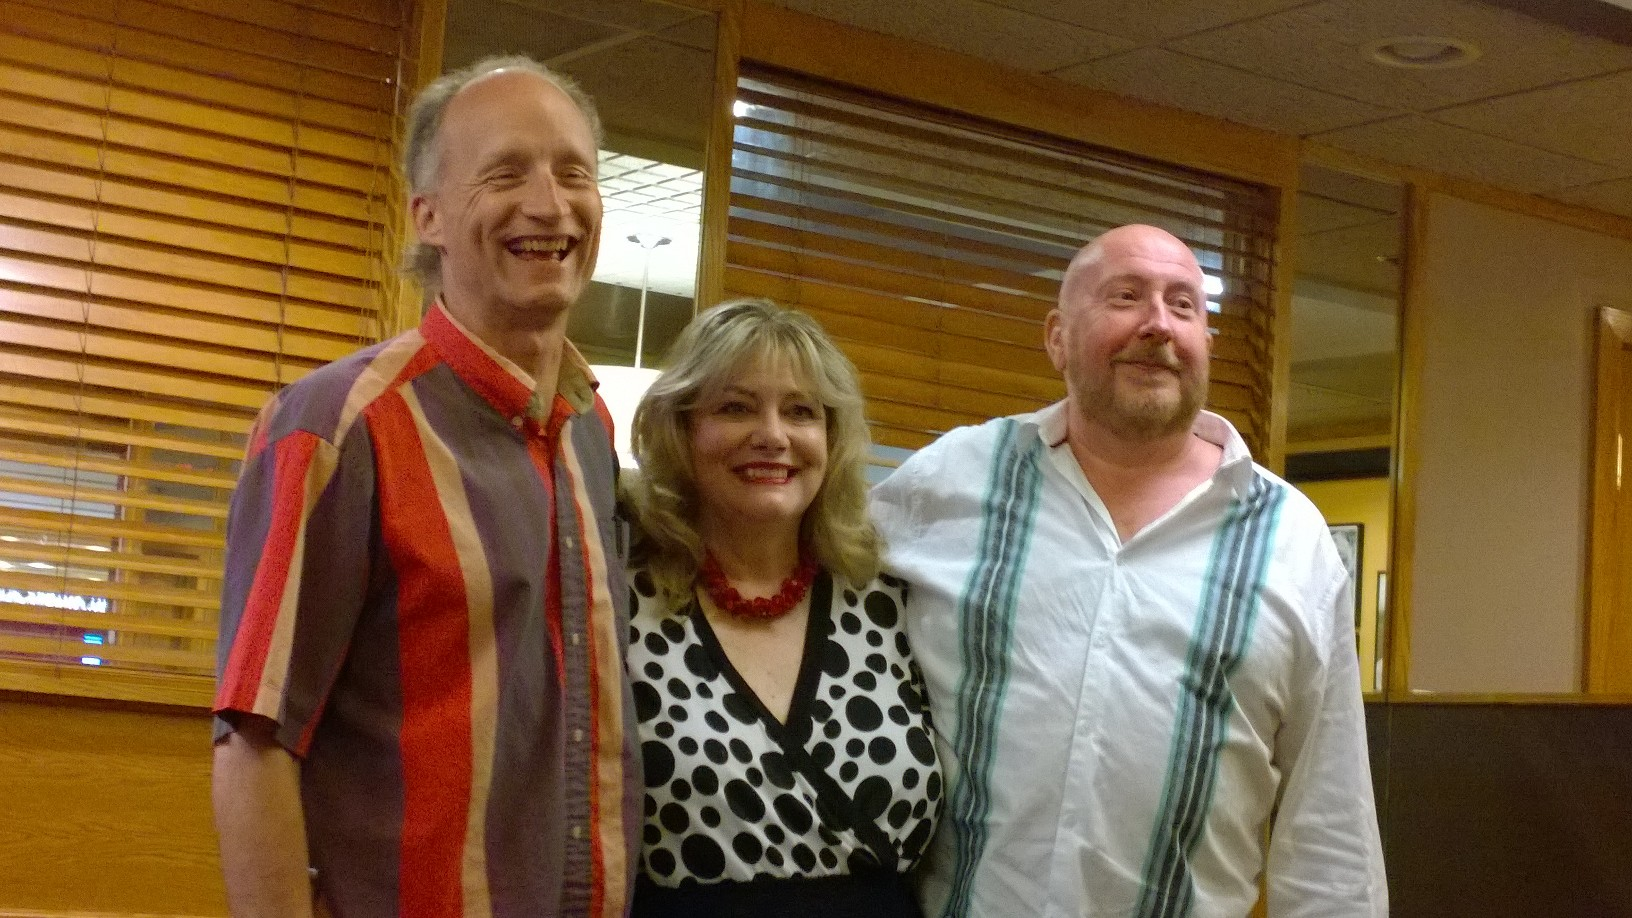 Richard O., Cynthia W. and Bill R. as The Three Headed Expert